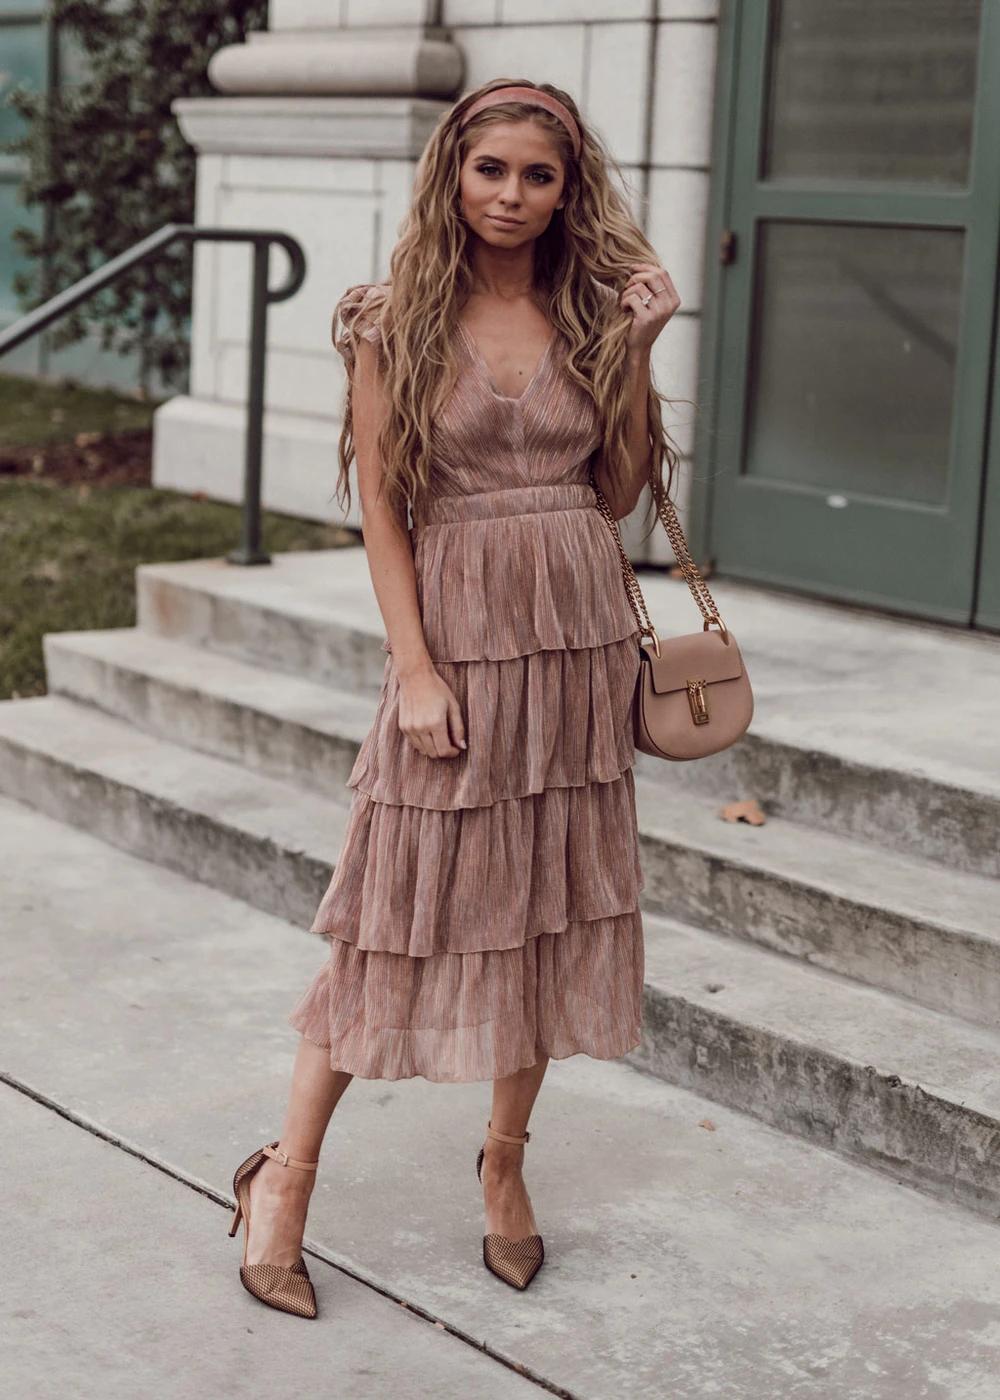 Blonde Fashion Style Womens Fashion Ootd Beach Waves Headband Holiday Dress Pink Dress Formal Dress Tan Chloe Tiered Dress Fashion Dresses [ 1400 x 1000 Pixel ]